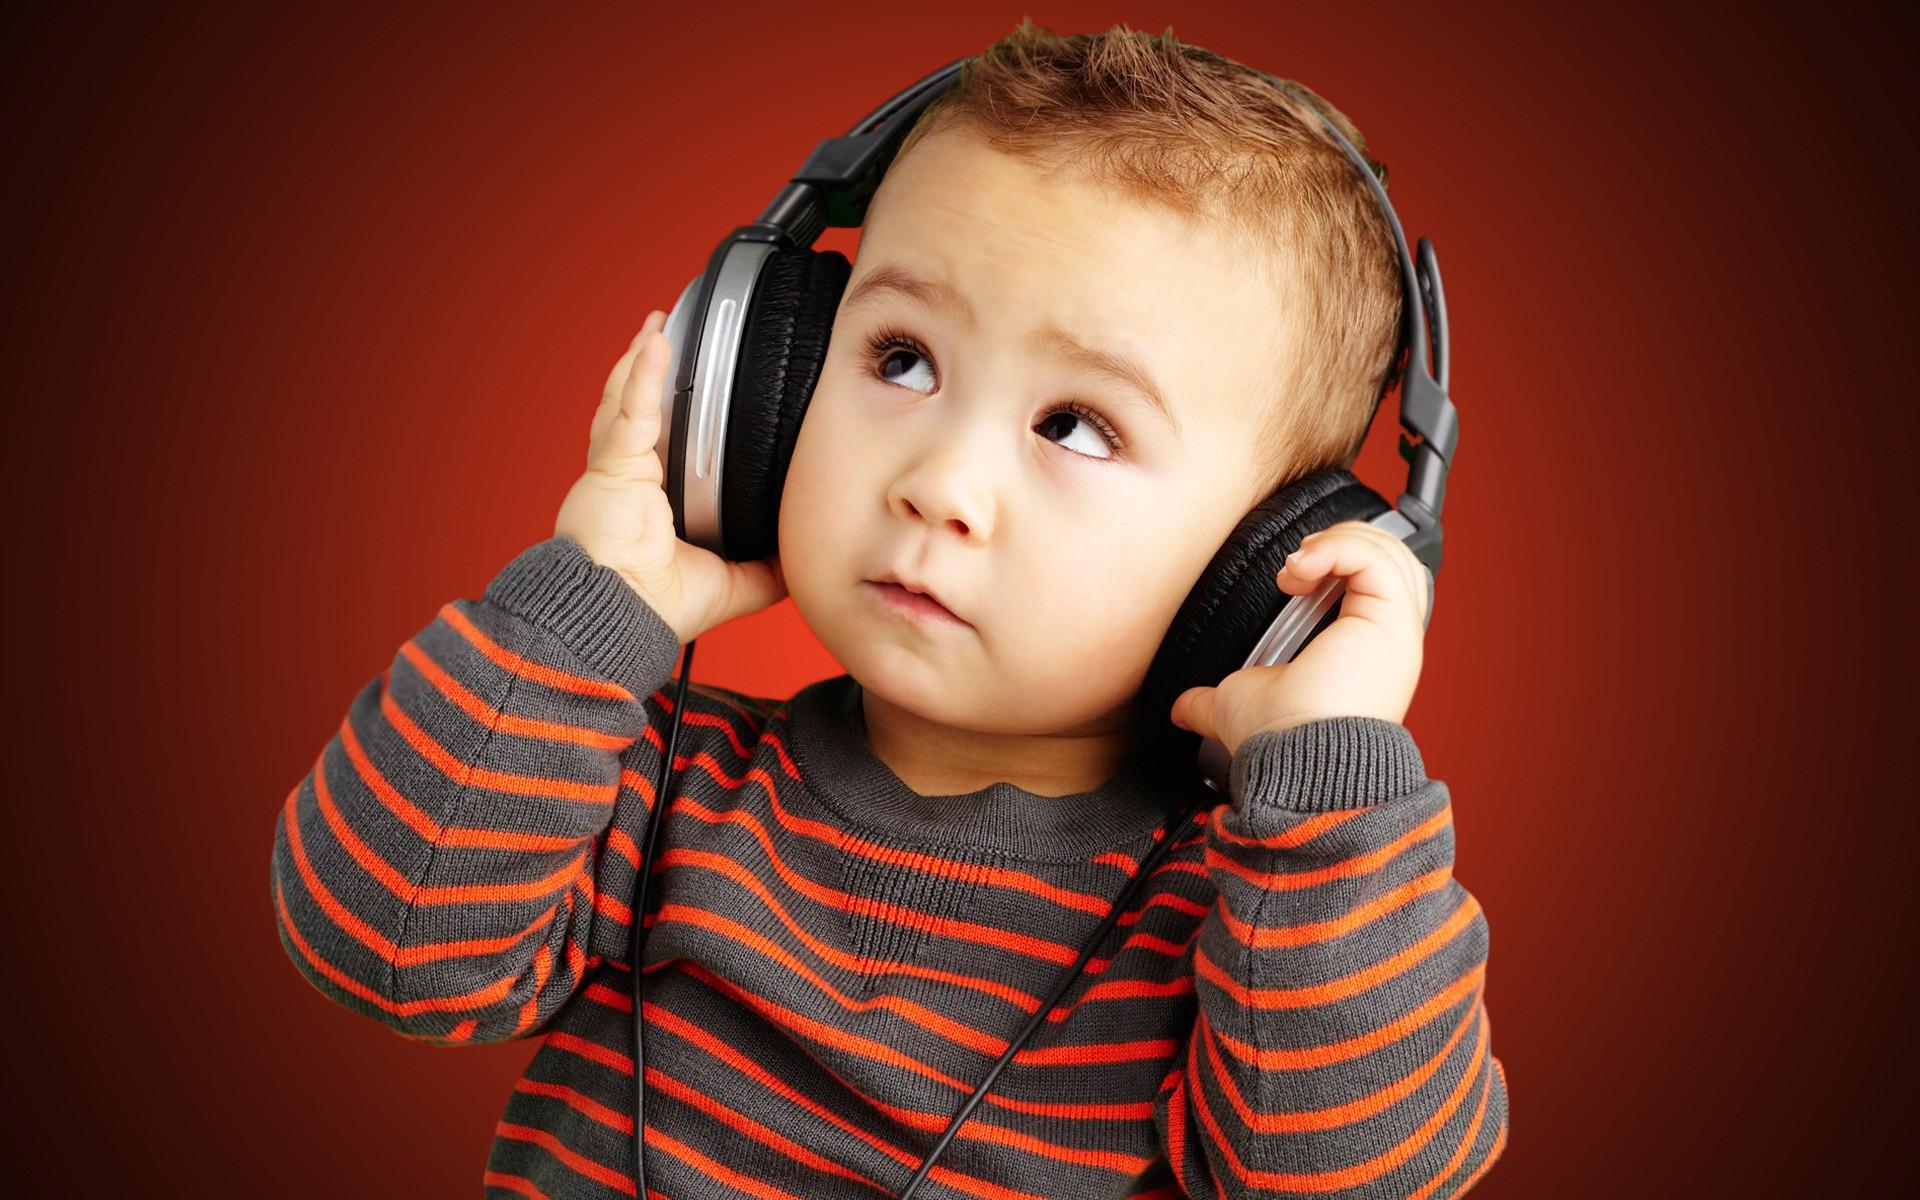 Cute Kids Images | ohidul.me